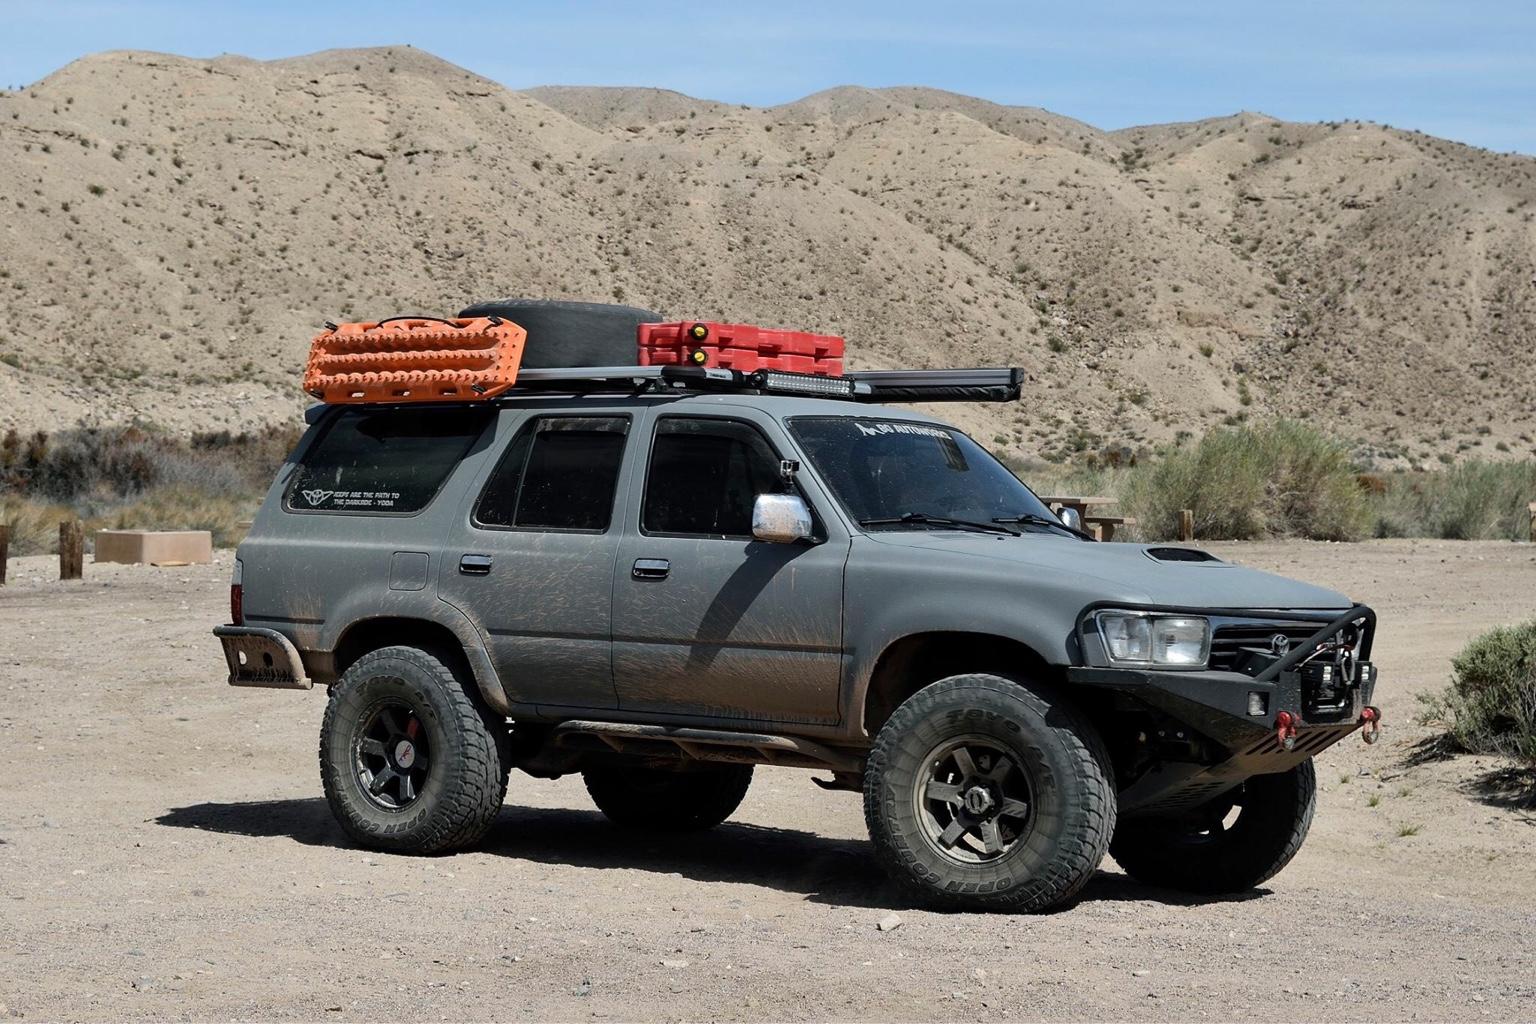 4runner roof racks expedition portal